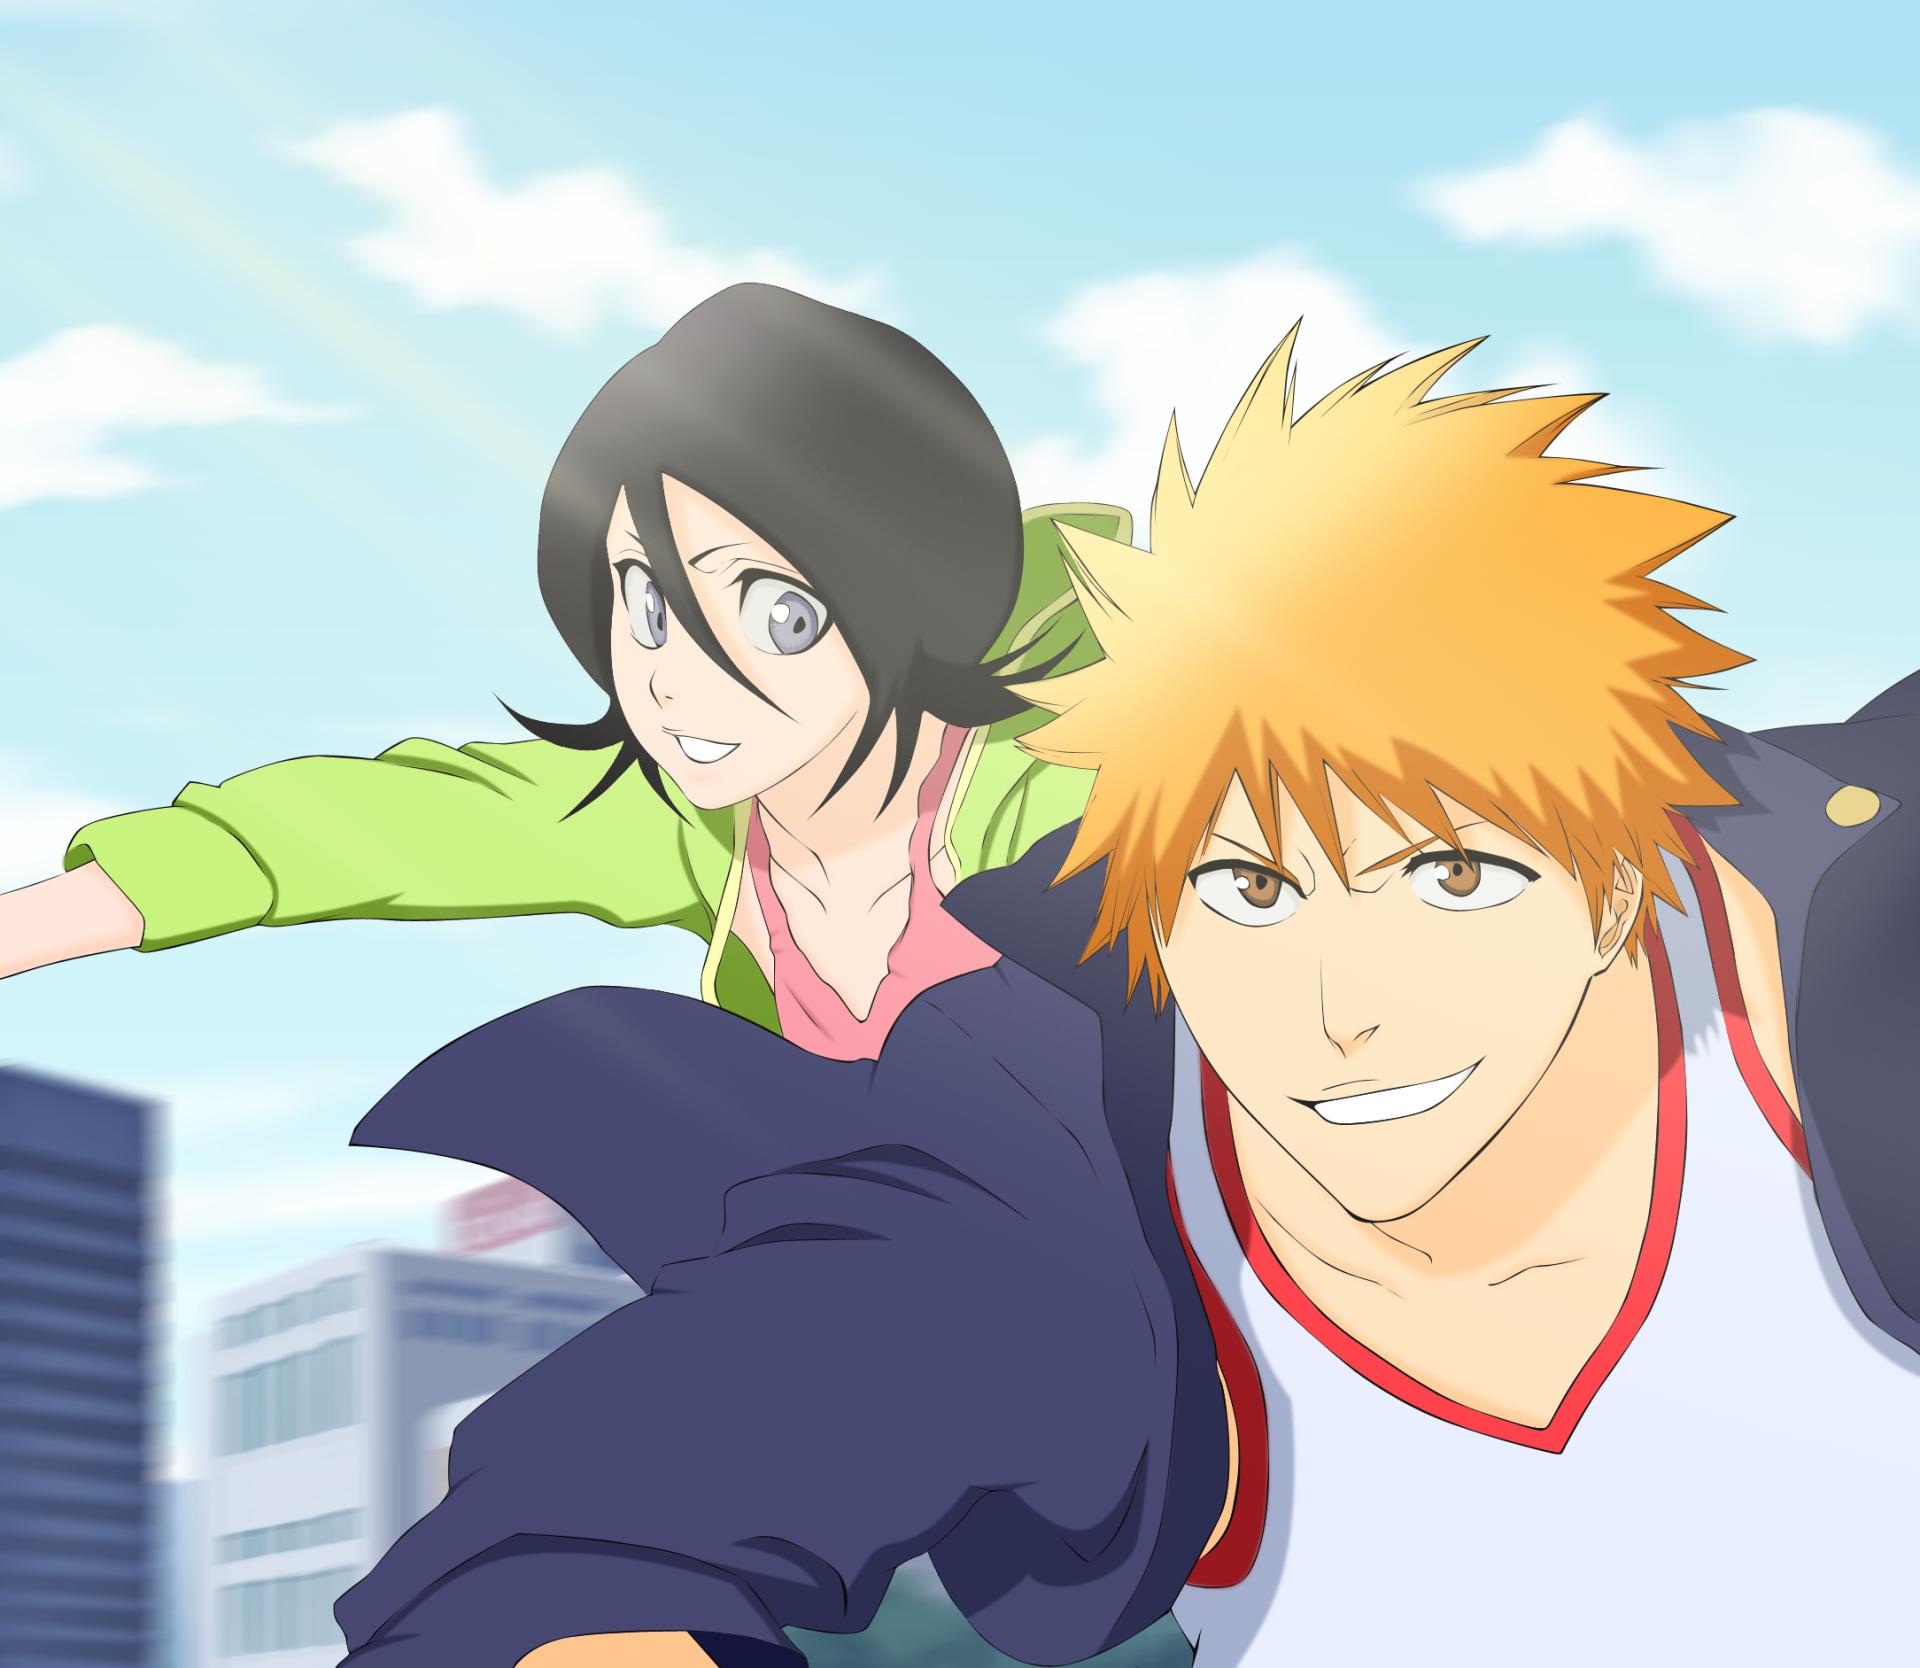 Anime - Bleach  Rukia Kuchiki Ichigo Kurosaki Bakgrund